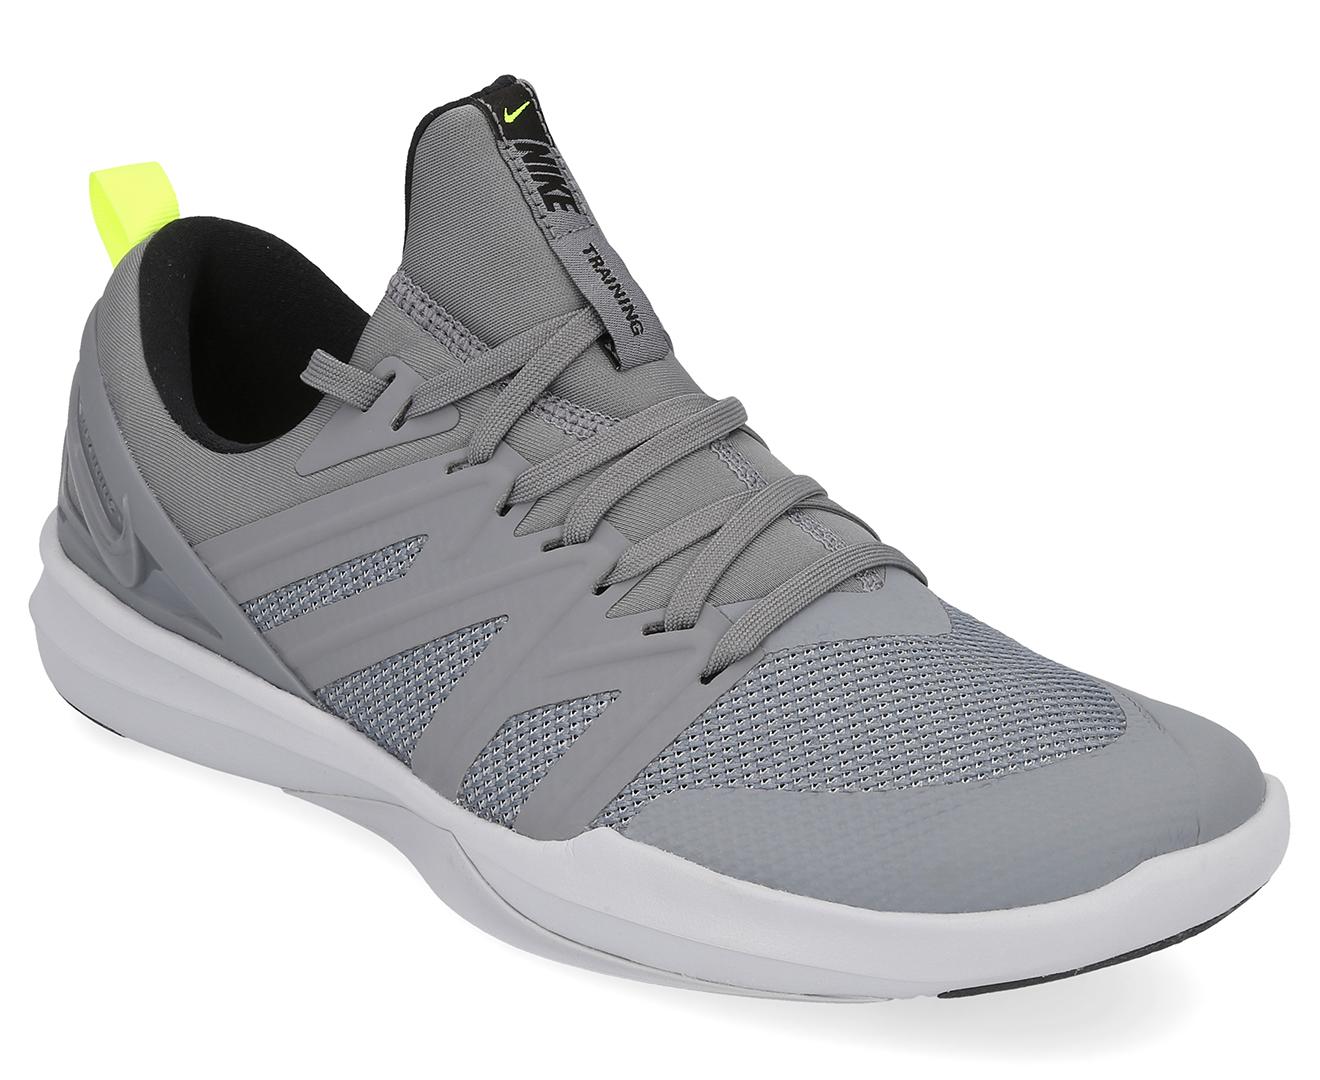 Buy Nike Men VICTORY ELITE TRAINER Training Shoes online